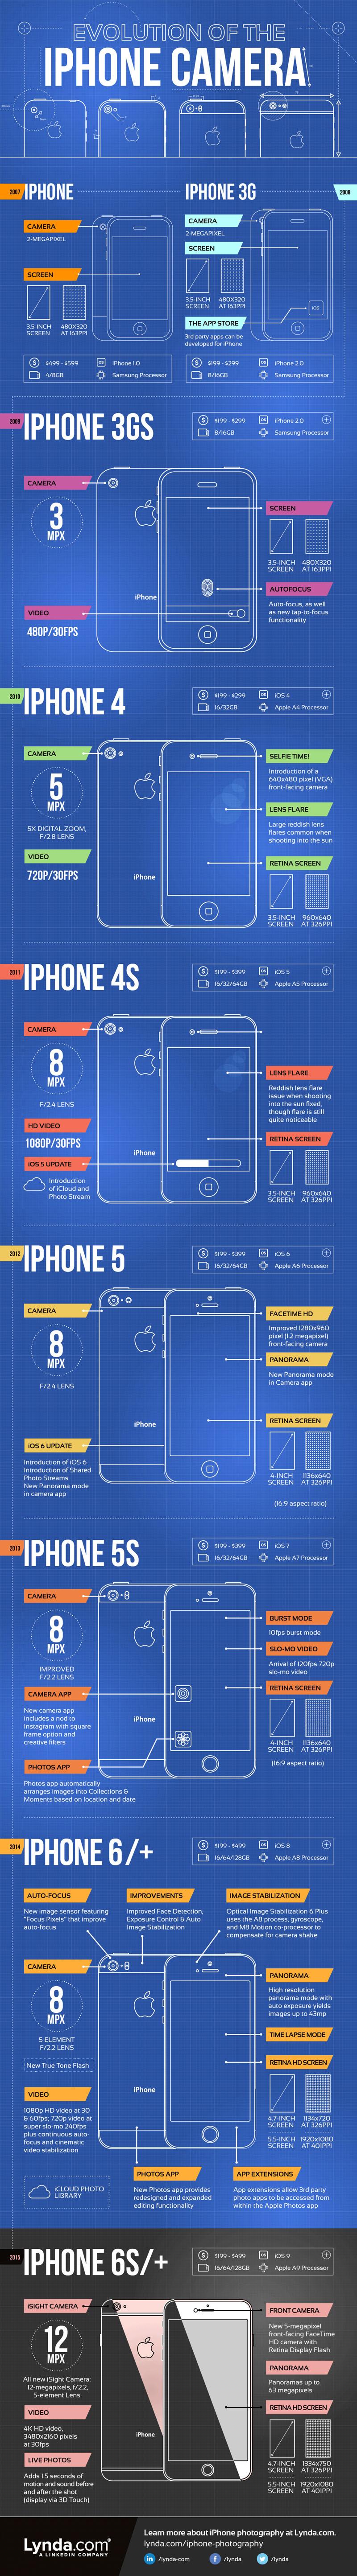 evolution-appareil-photo-iphone Infographie : l'évolution de l'appareil photo de l'iPhone